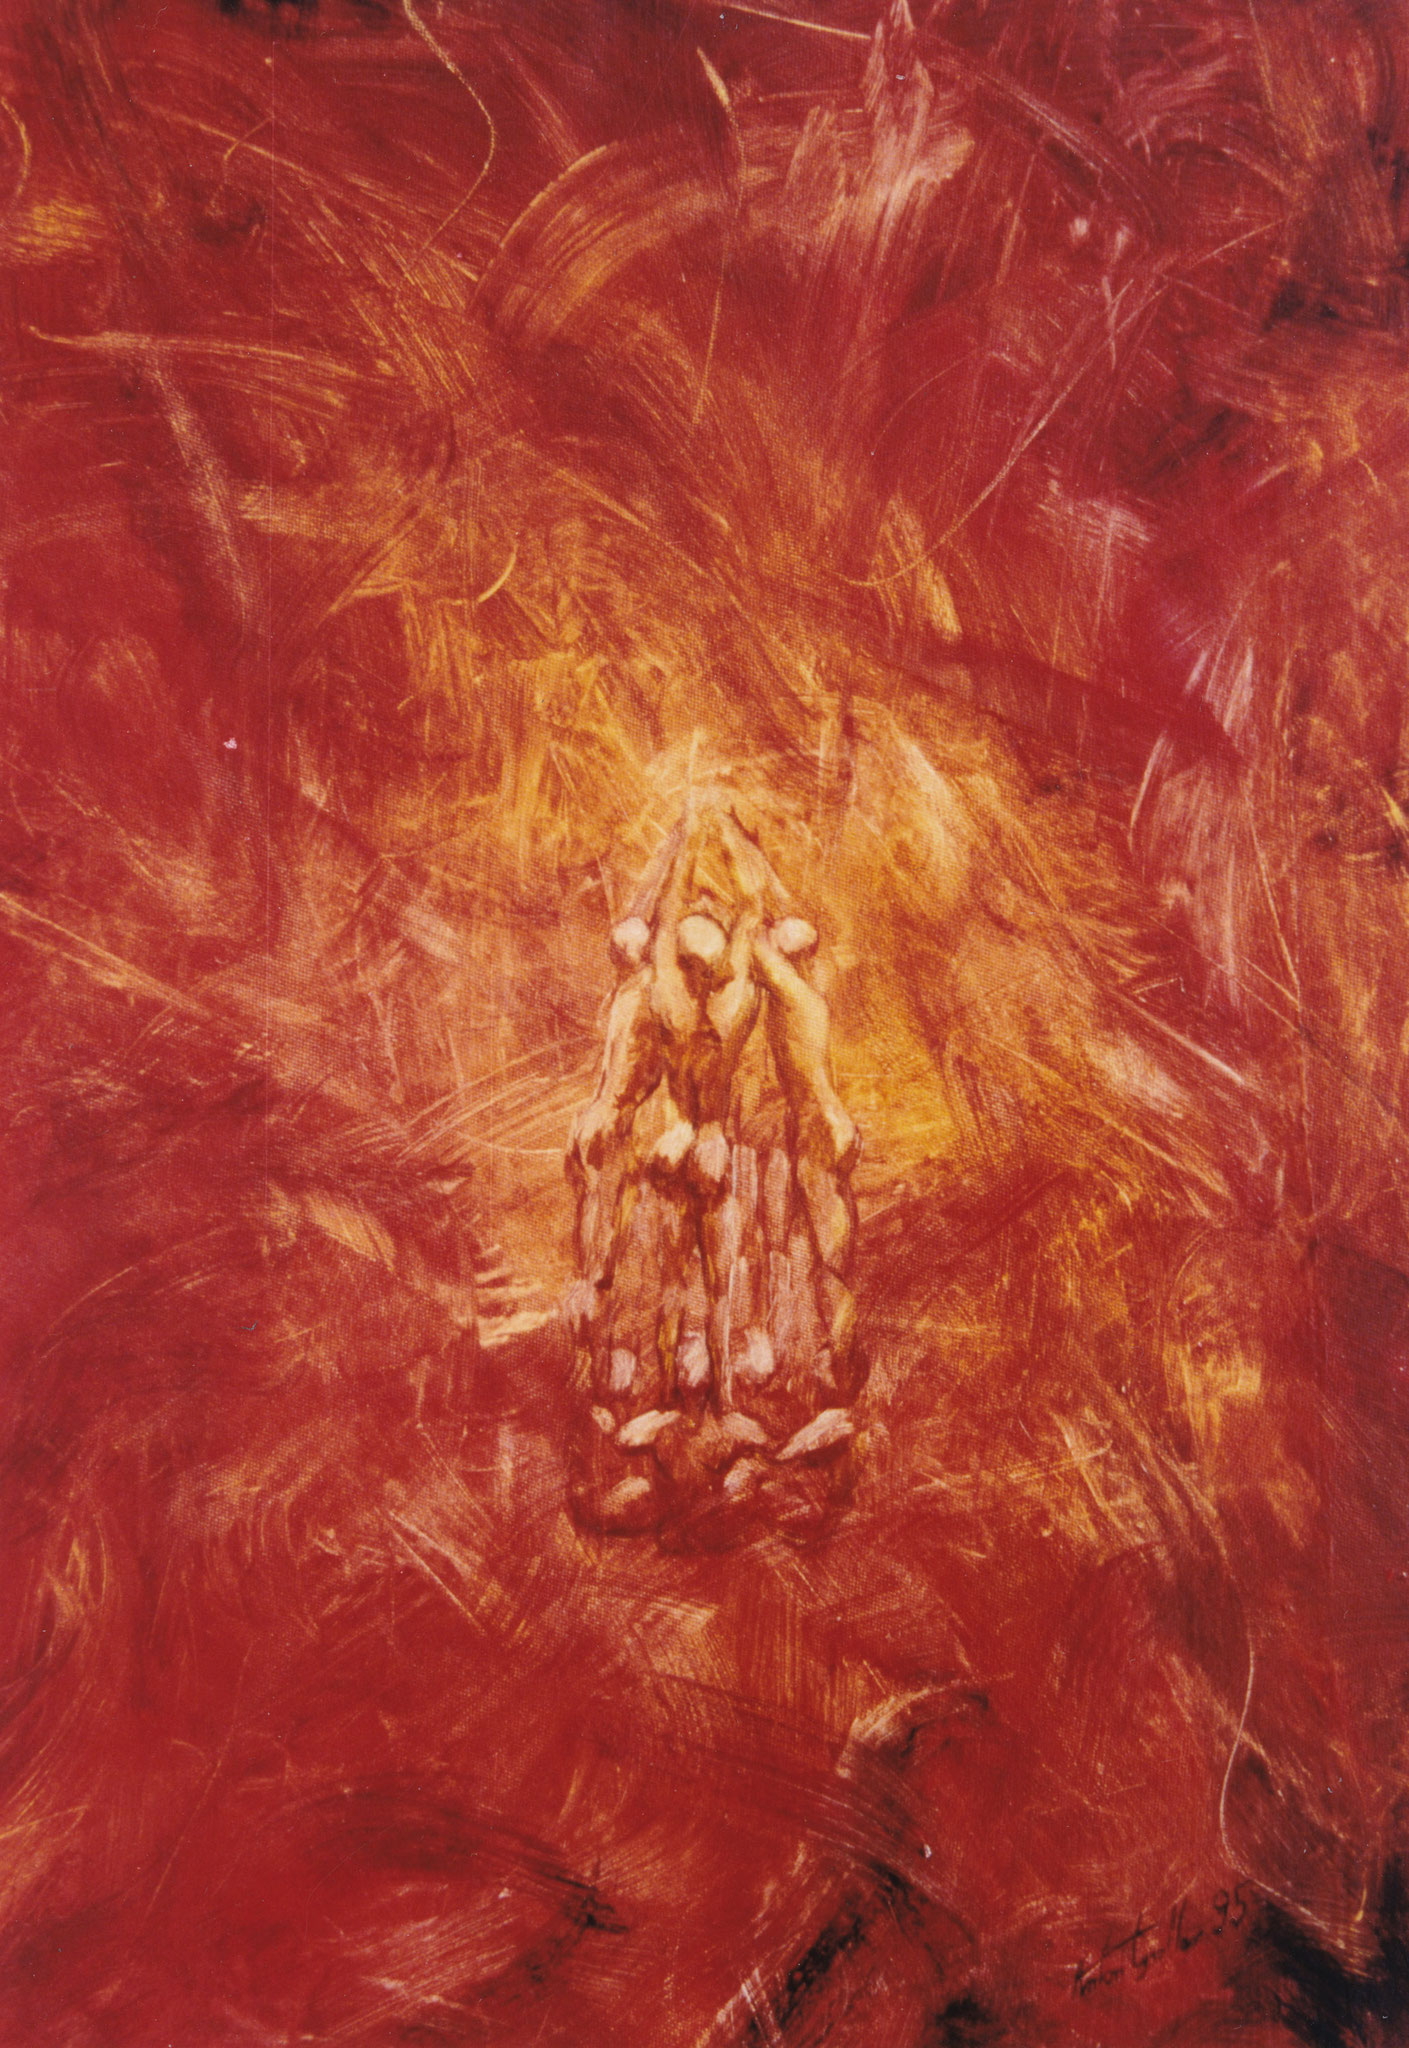 Knospe II, Öl auf Leinwand, 70x50 cm